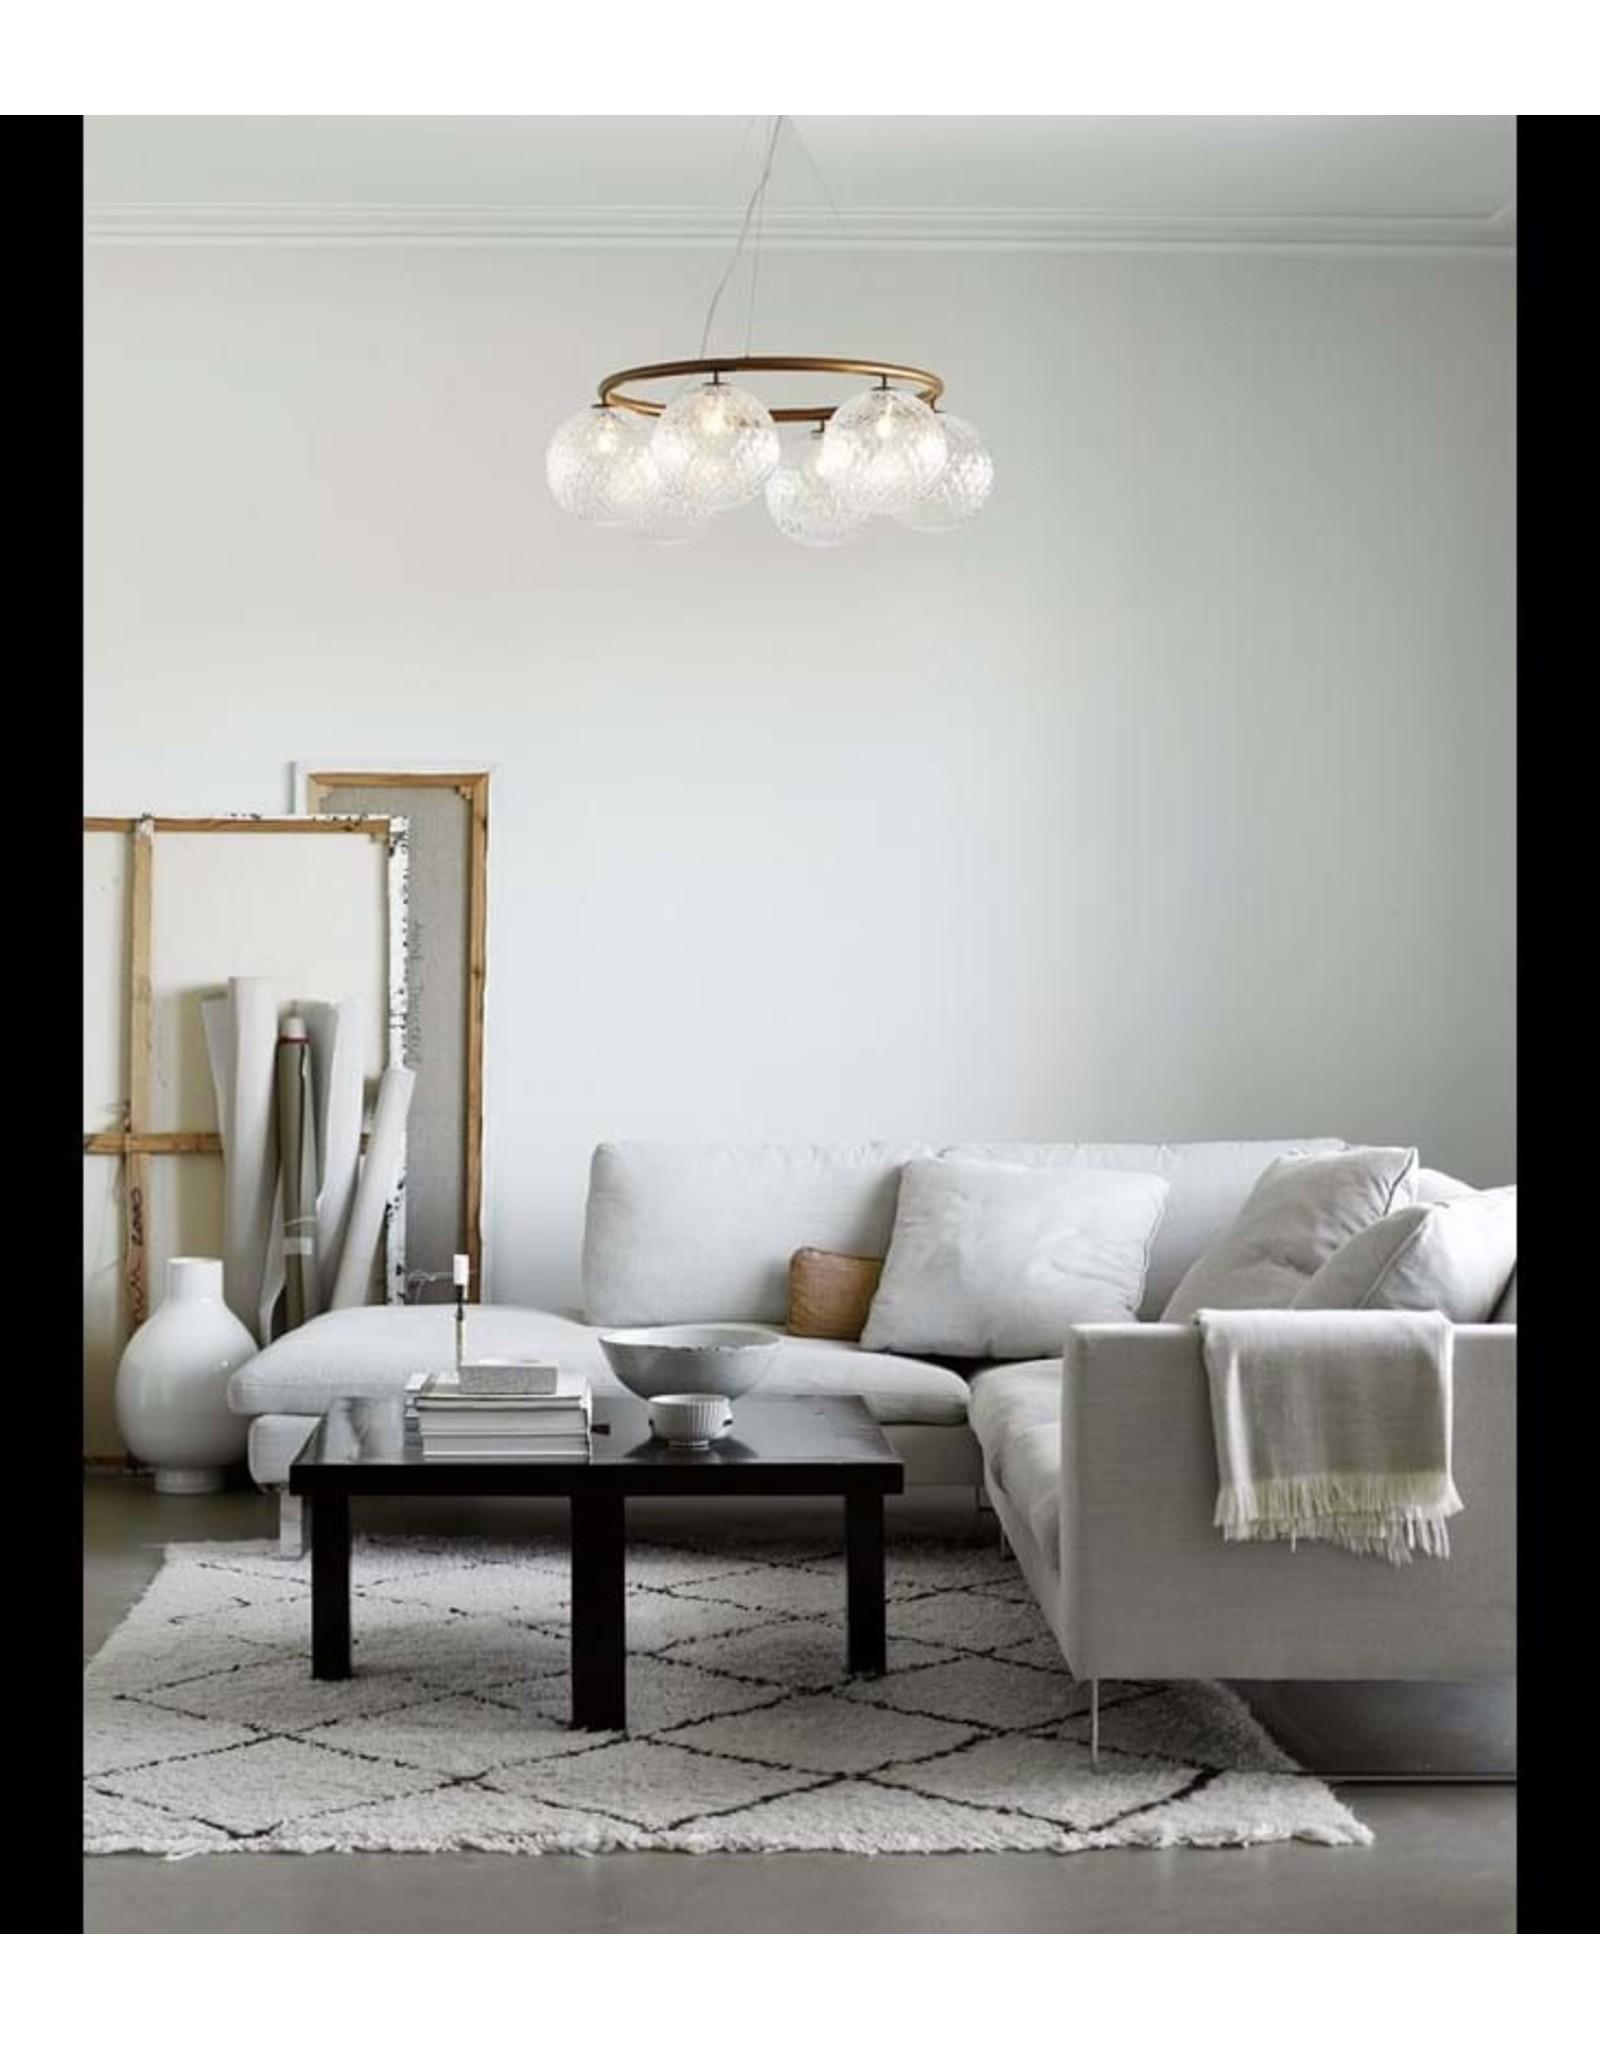 NUURA MIIRA 6 CIRCULAR PENDANT LAMP